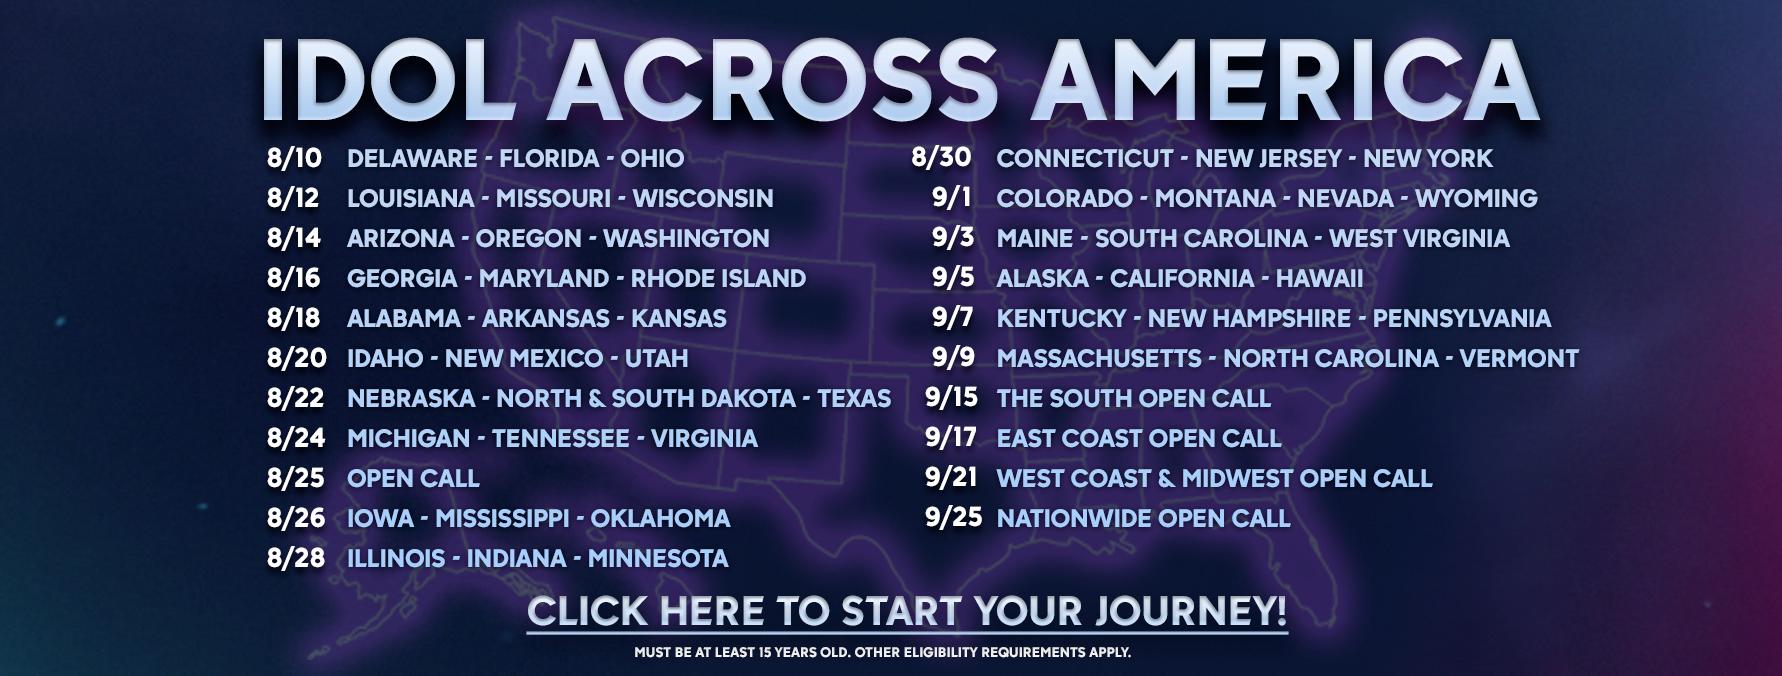 American Idol - Idol Across America Schedule